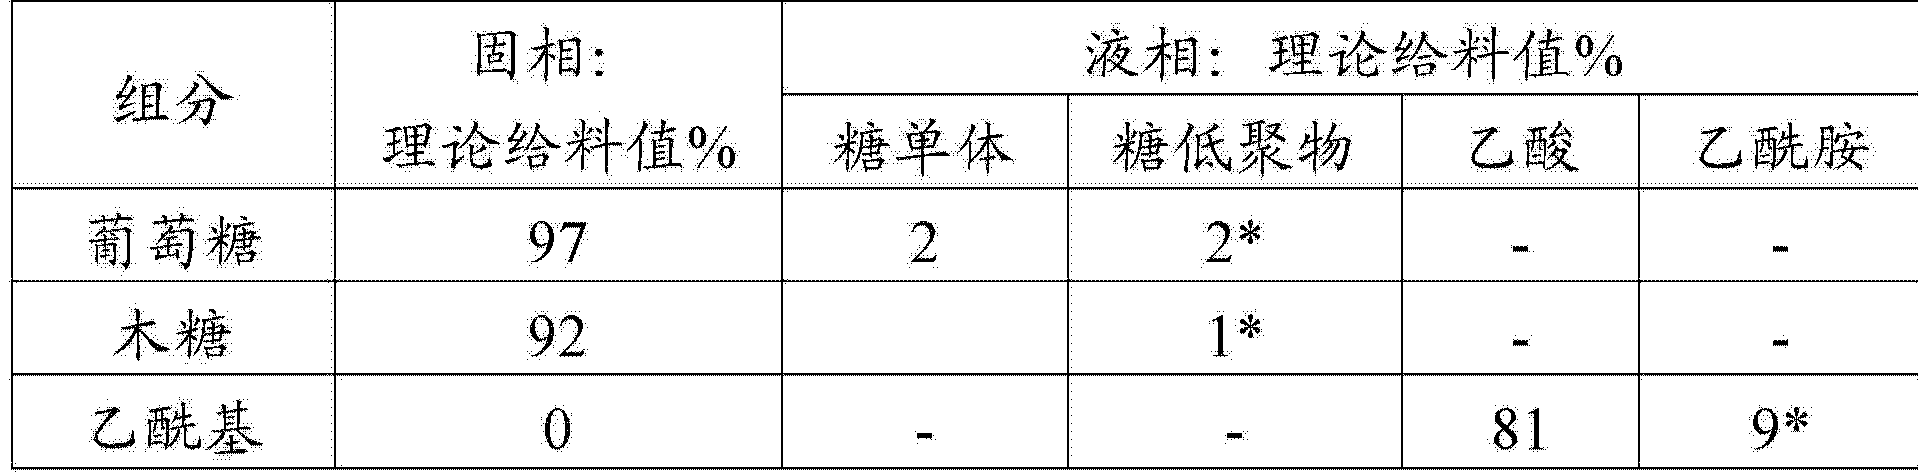 Figure CN104911228AD00162